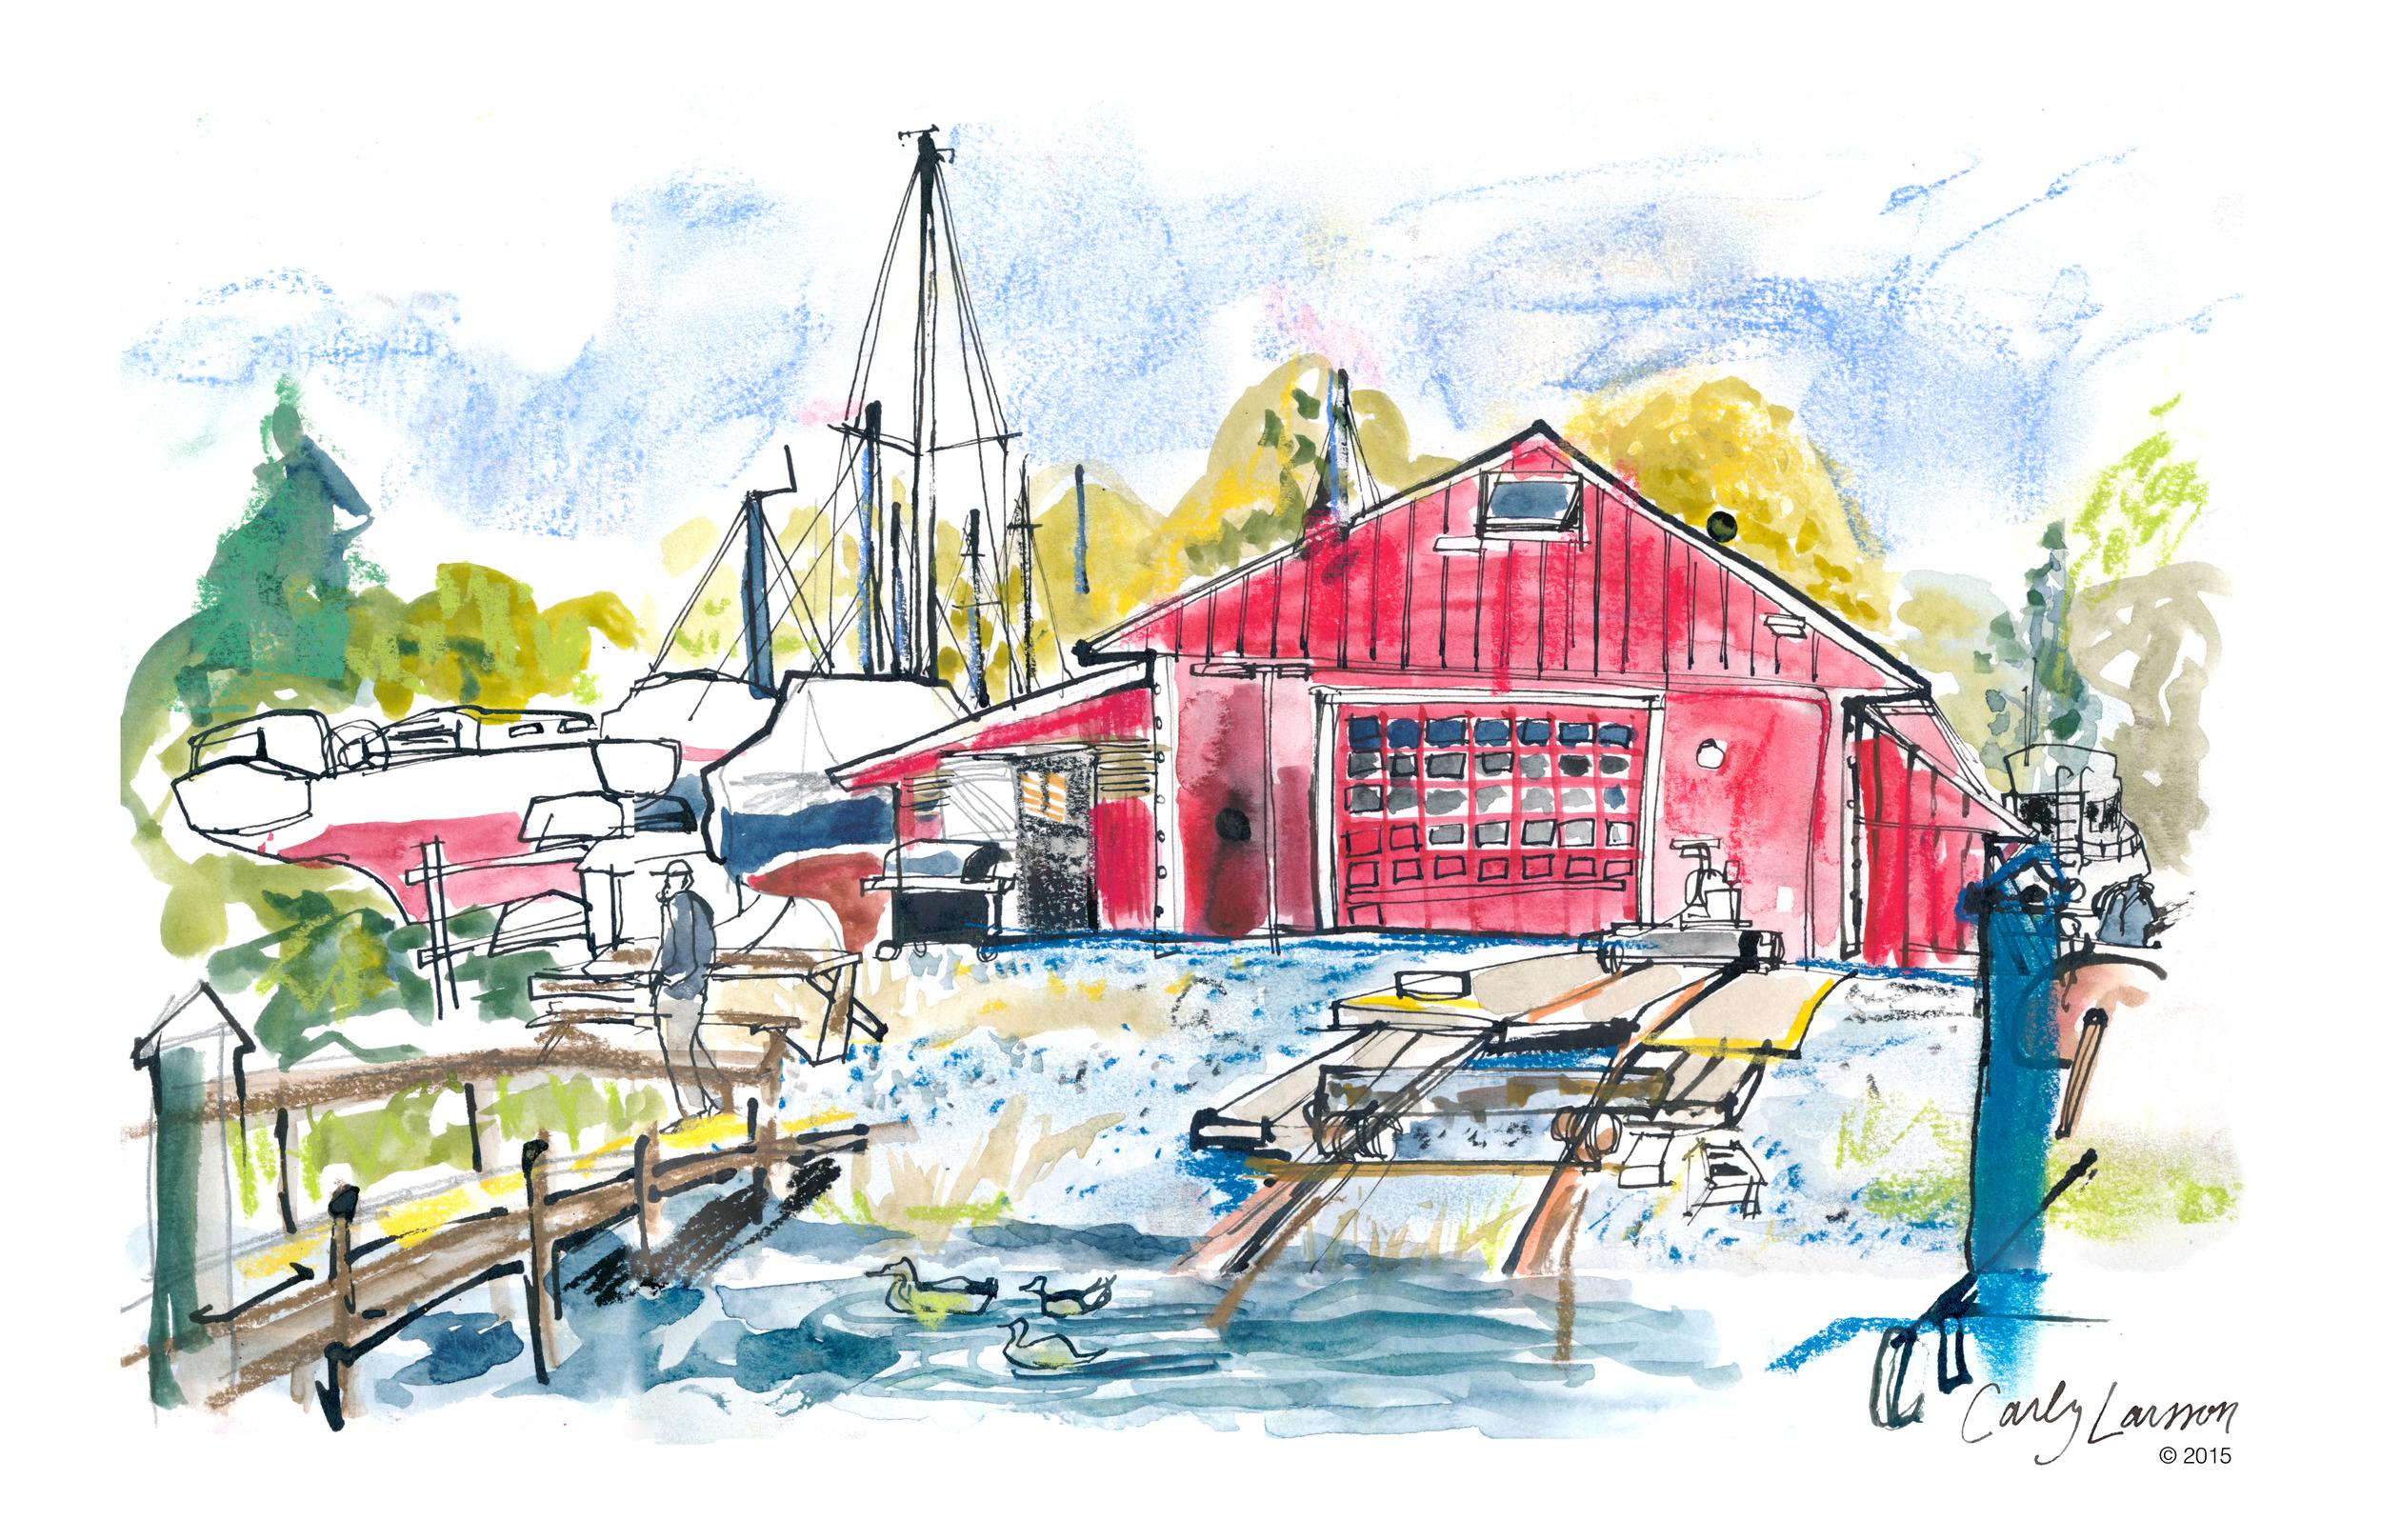 Bucky Barlow's Boat Yard, Pocasset MA. © Carly Larsson 2015